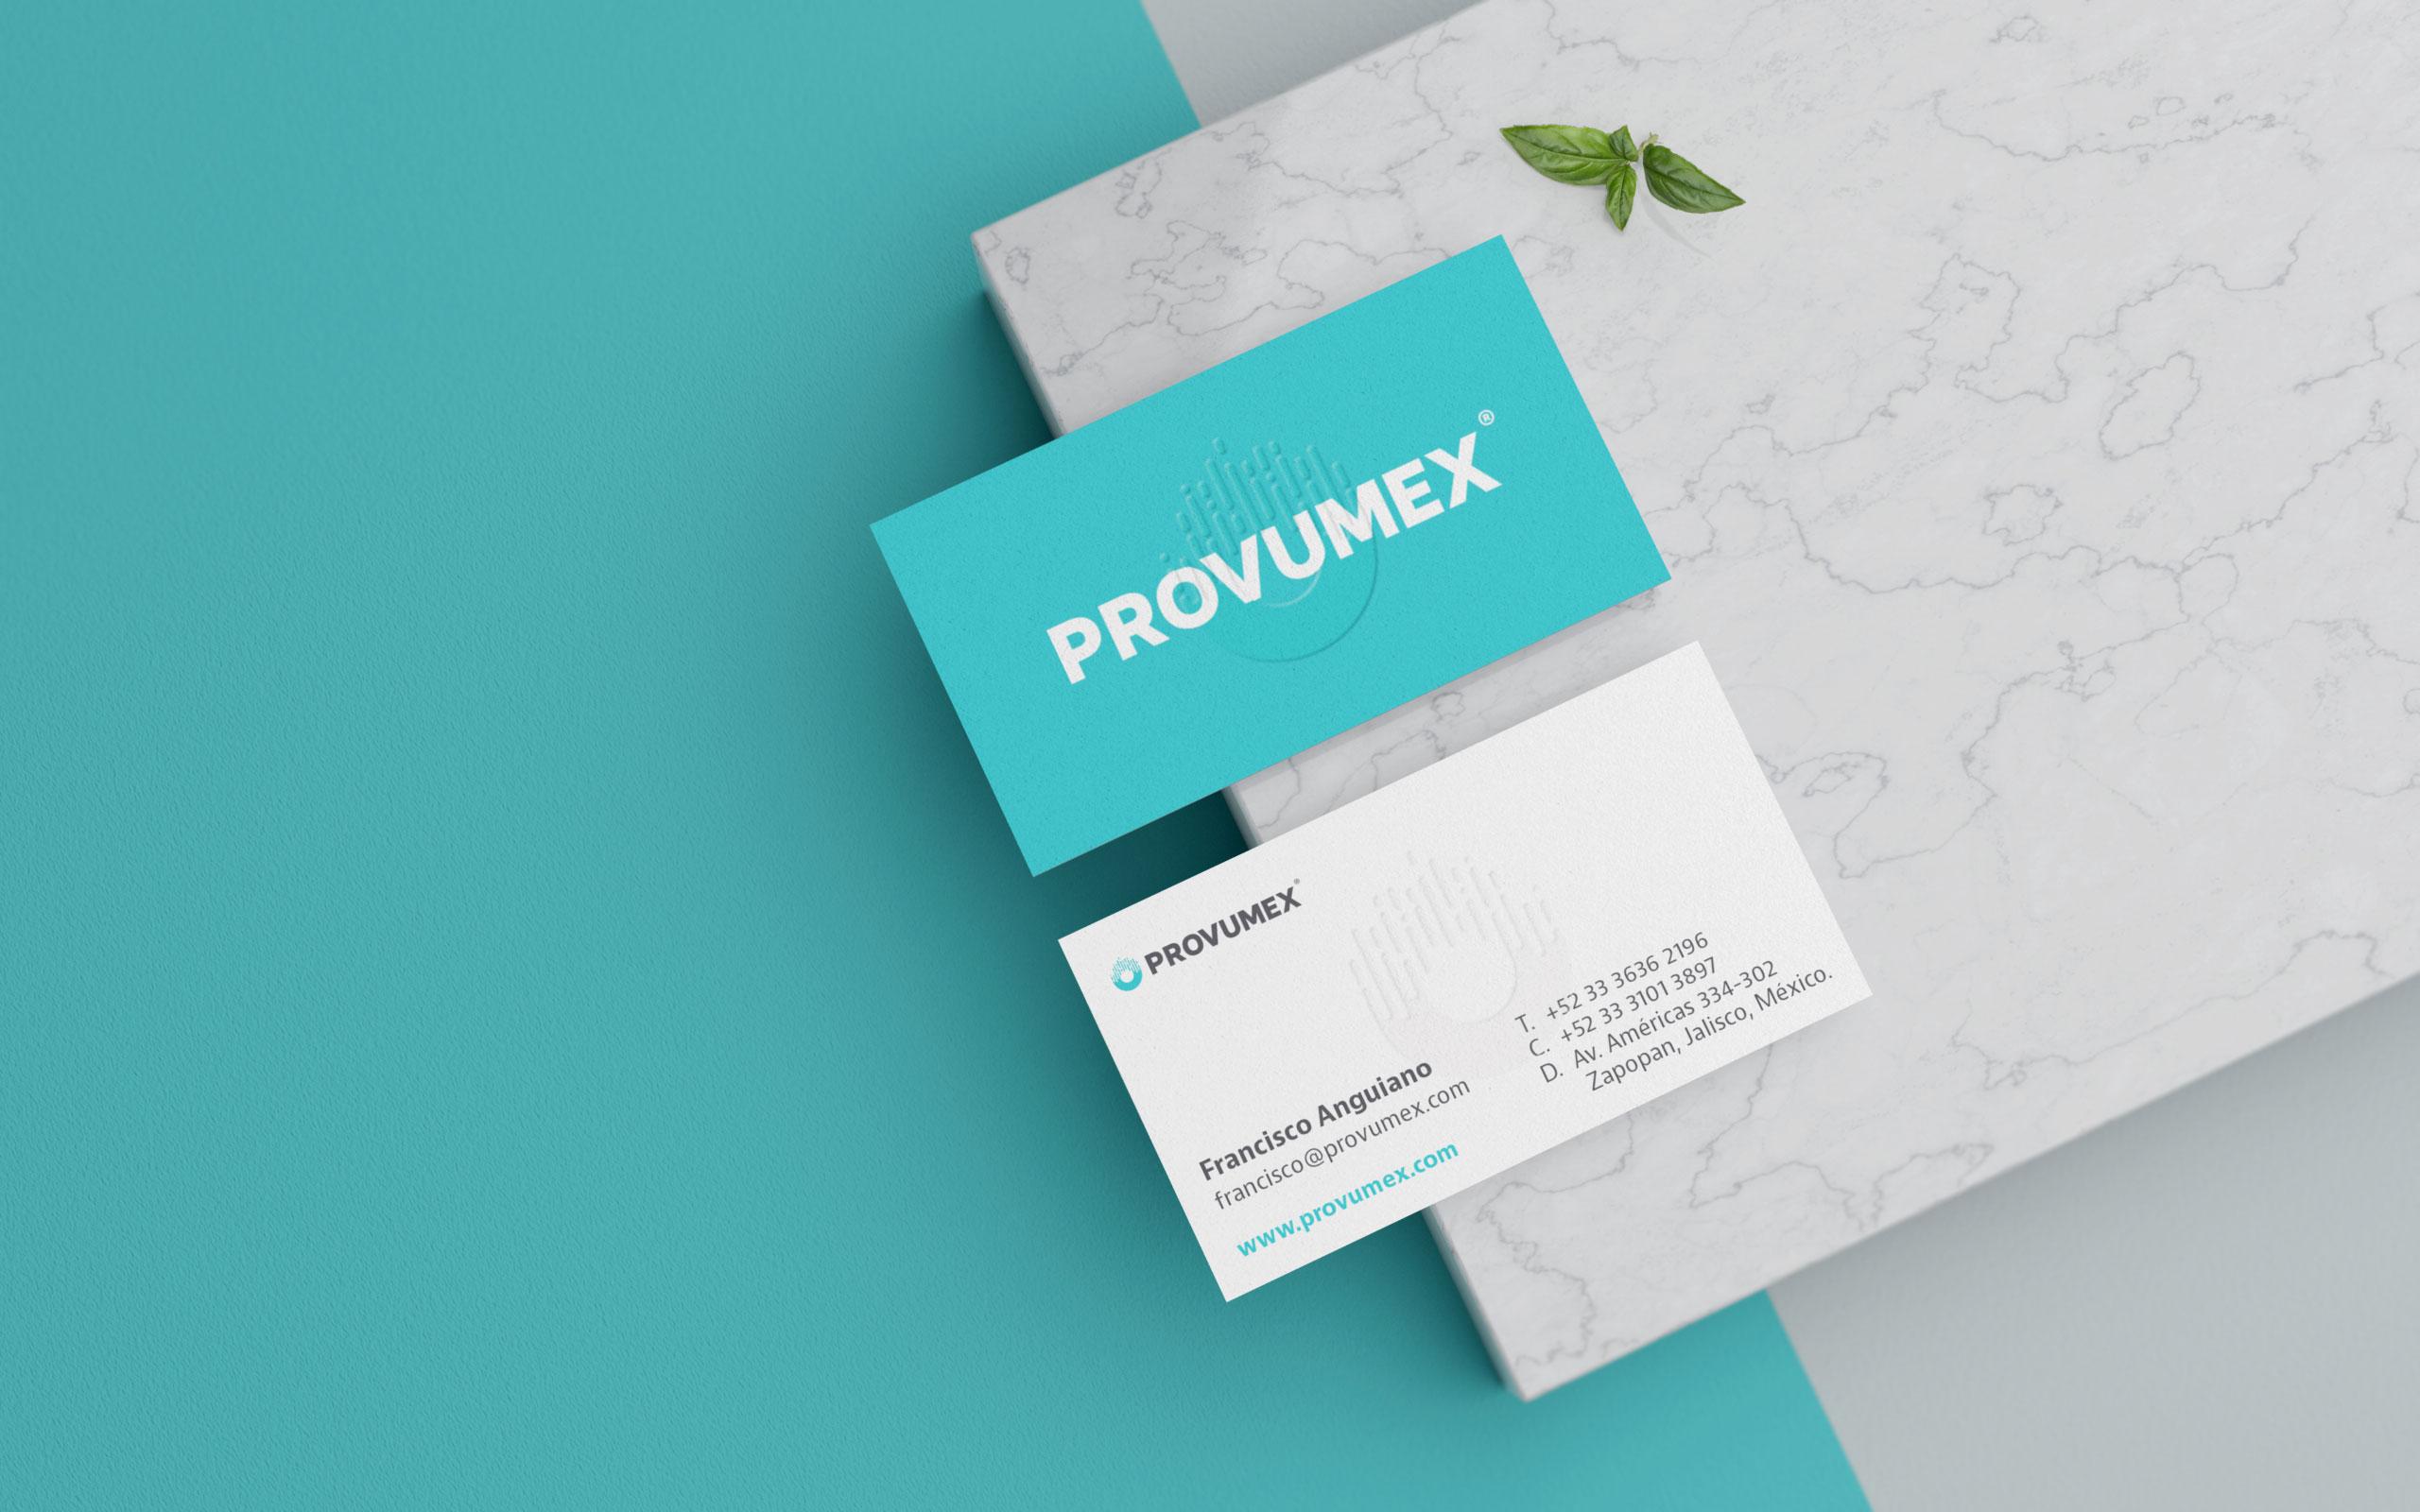 Provumex-01